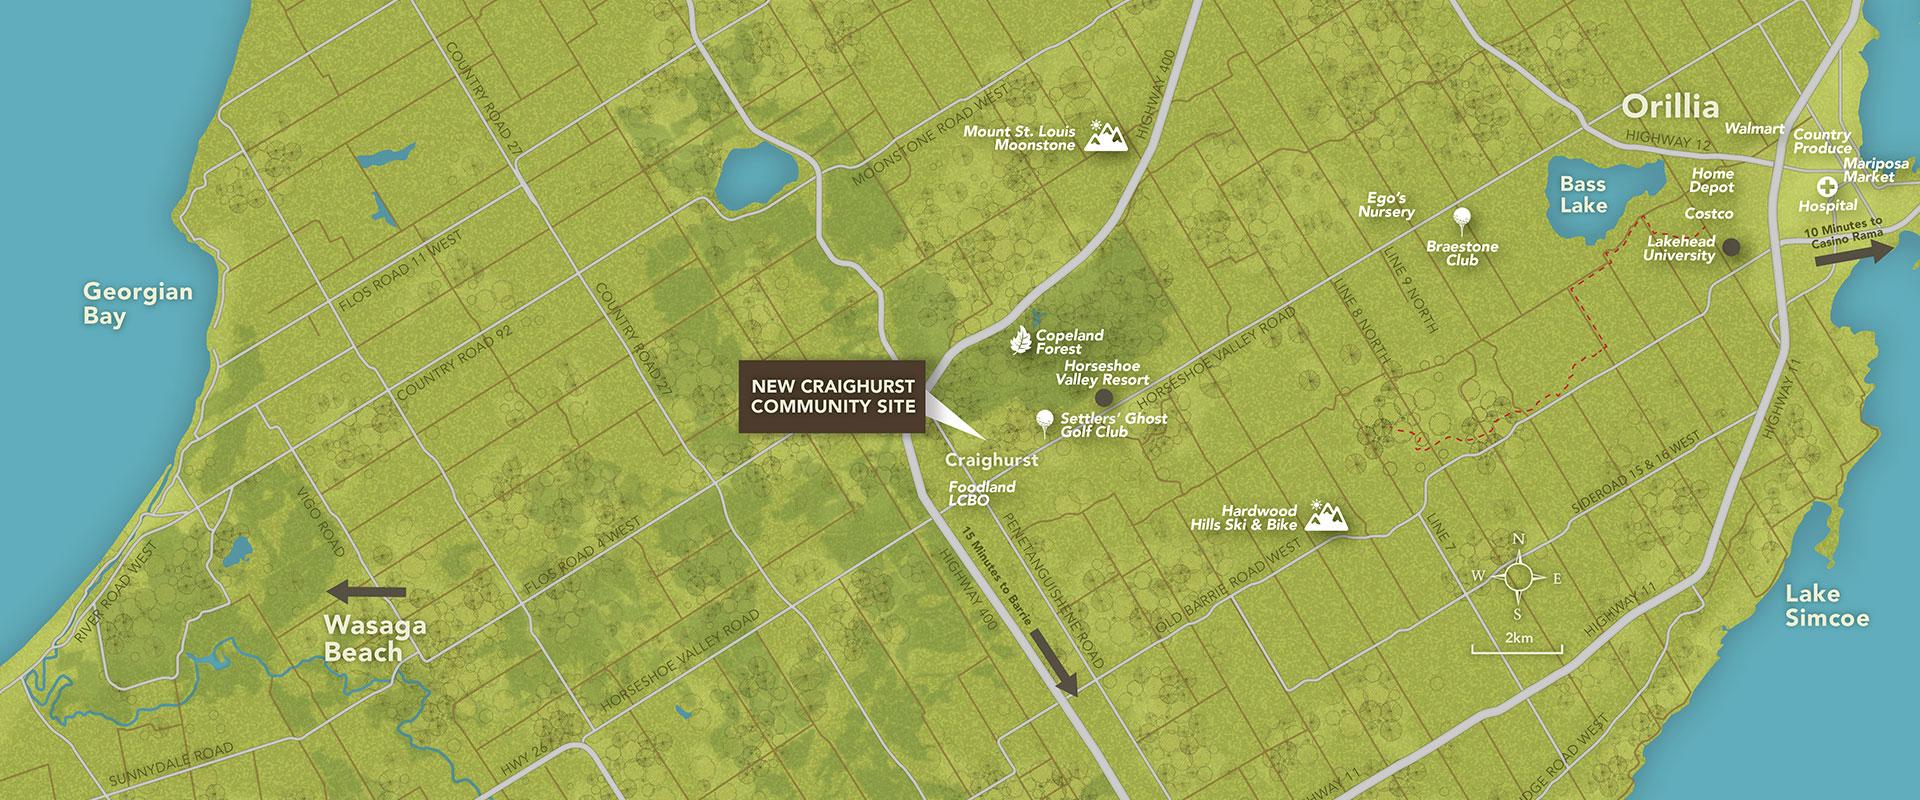 Craighurst Community Map Location